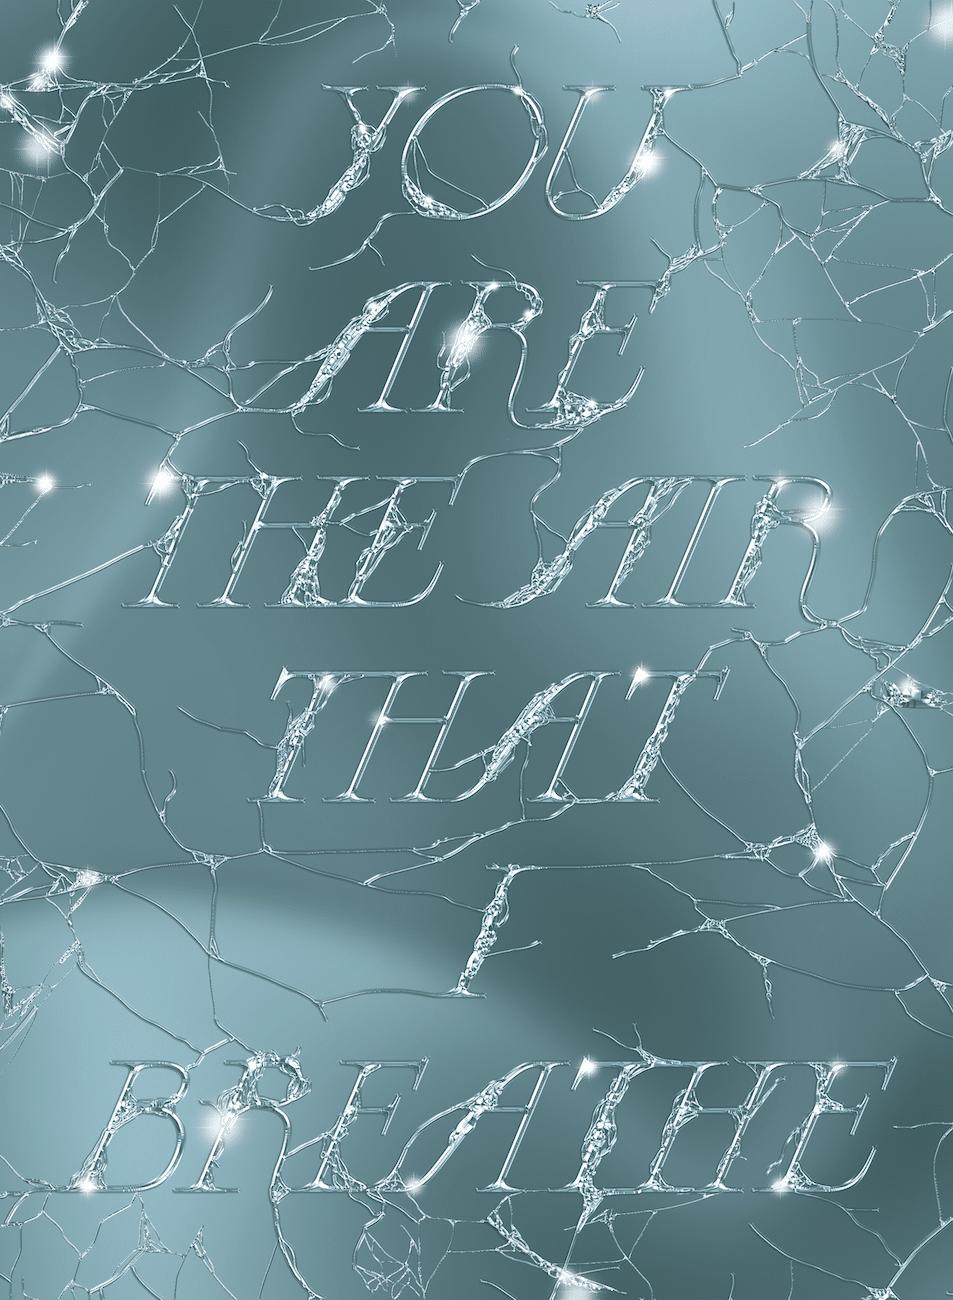 Typo-Buch-Tipp New Aesthetic mit Sophia Brinkerd und Leonhard Laupichler